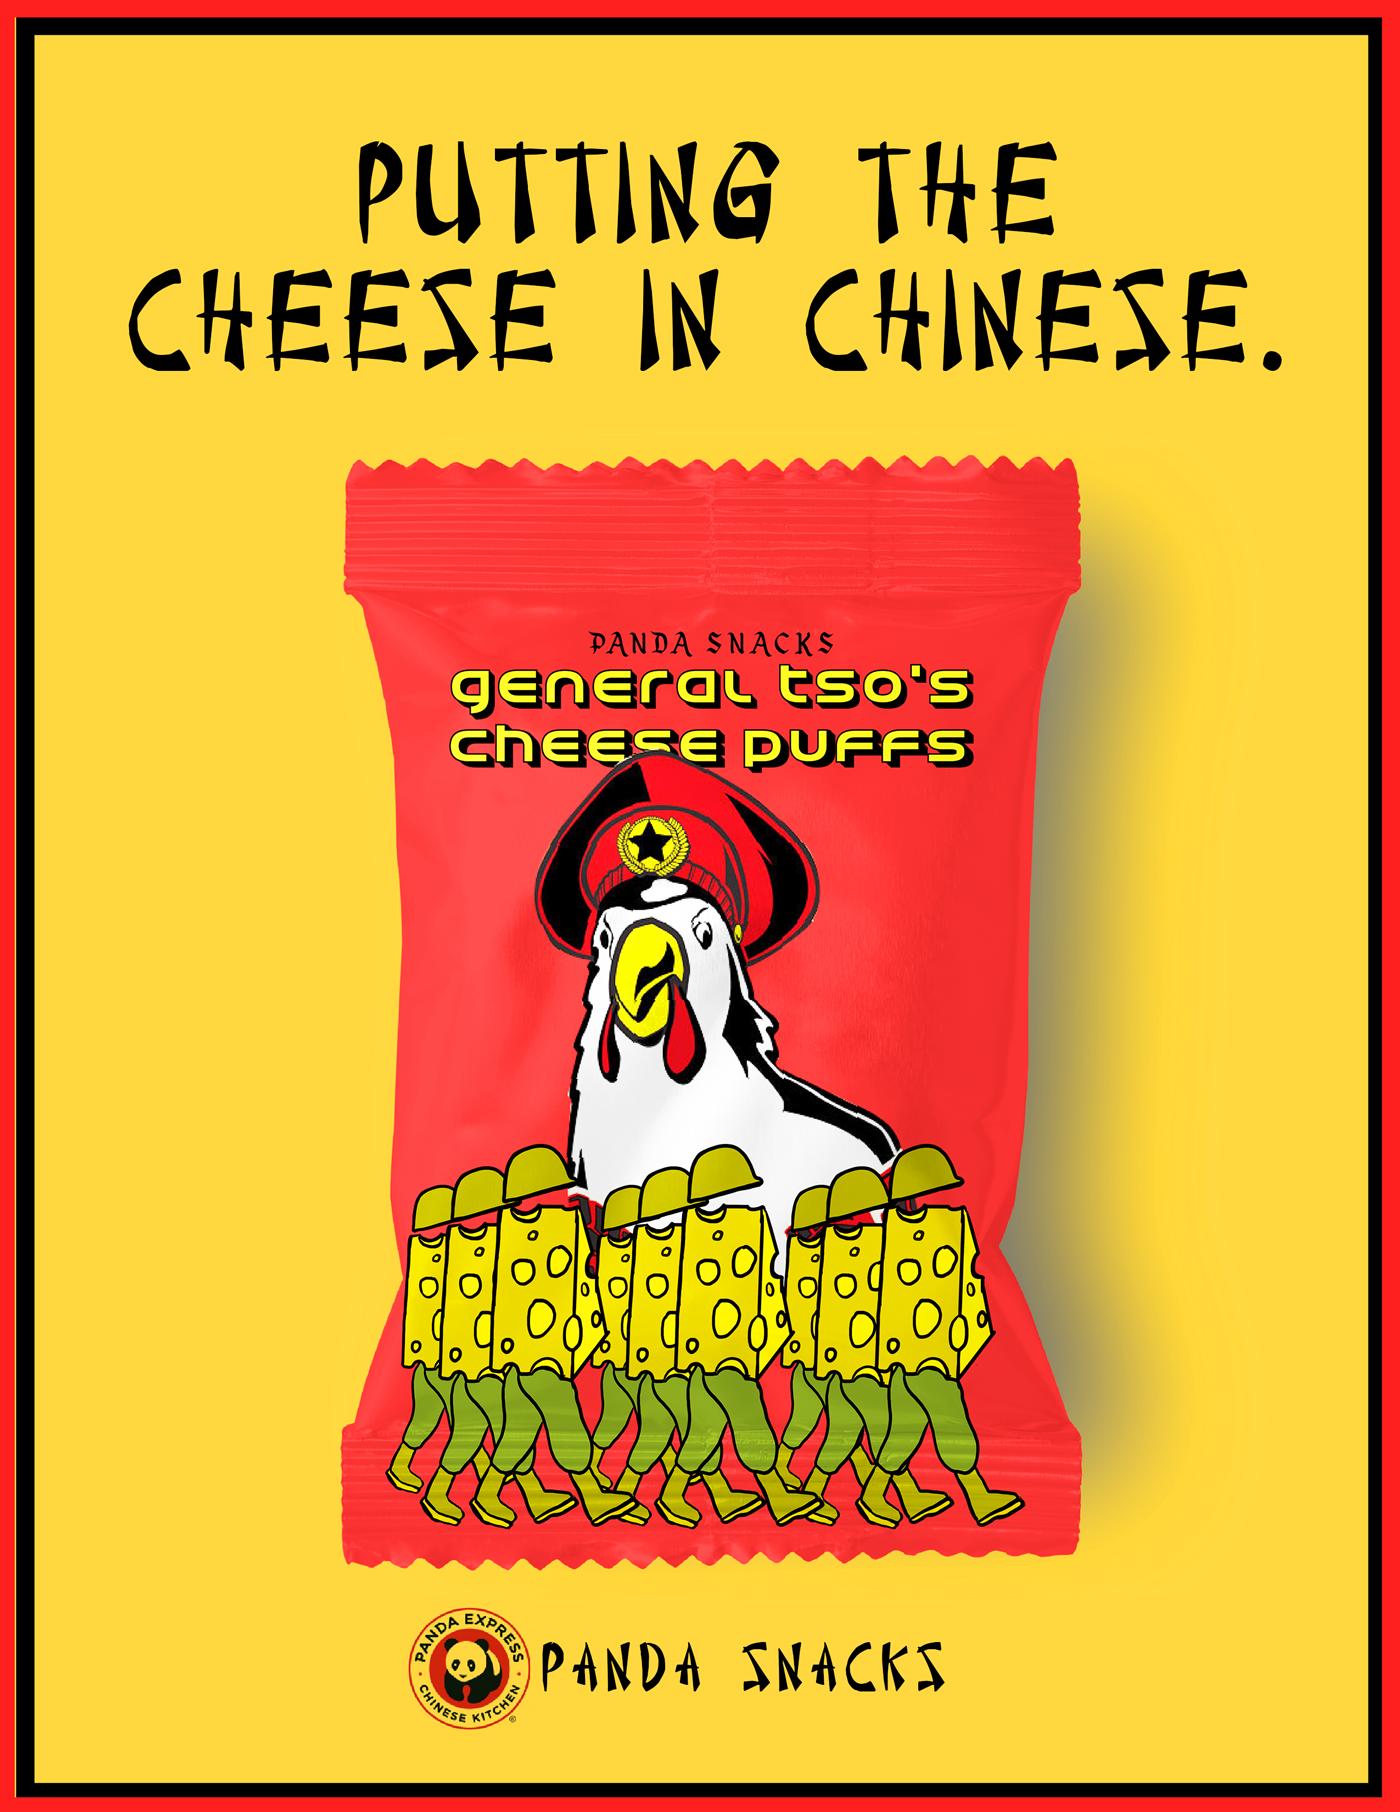 panda snacks general tsao's.png